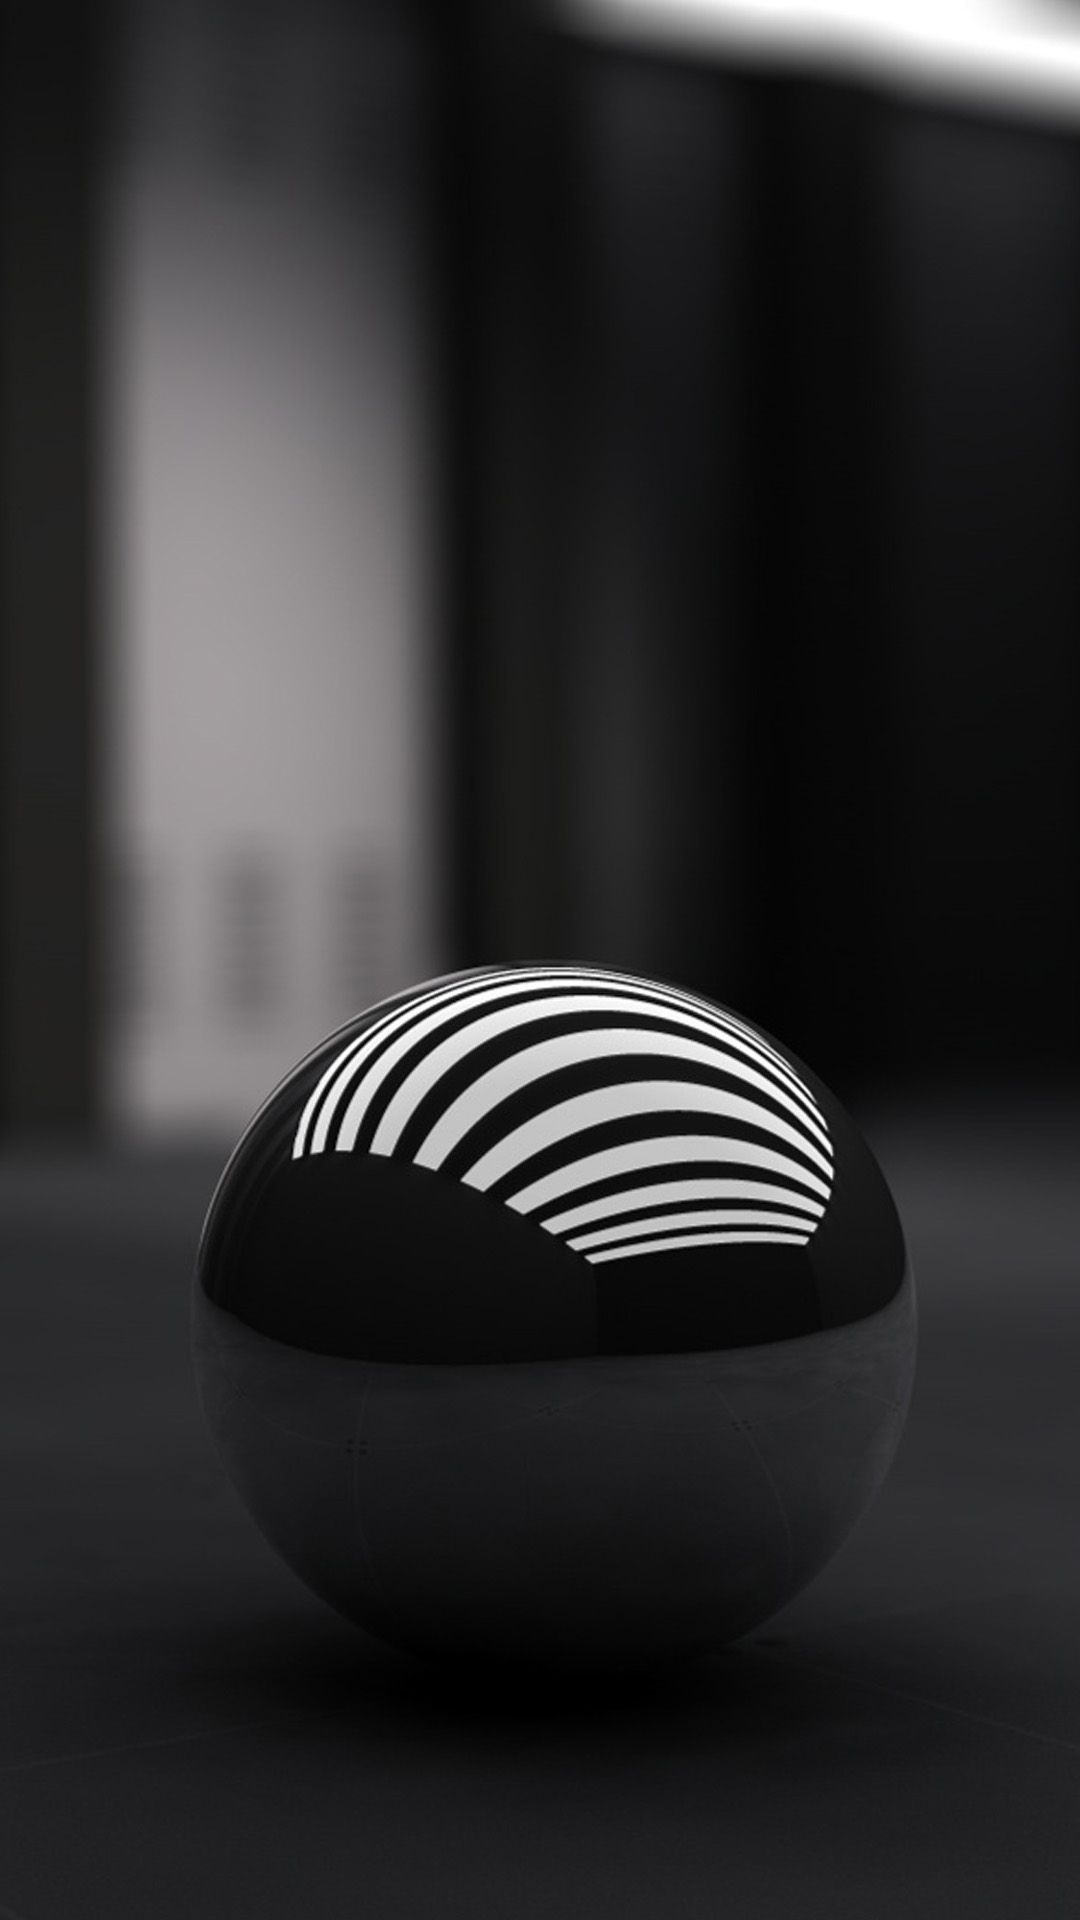 3D Black Ball Galaxy S5 Wallpaper